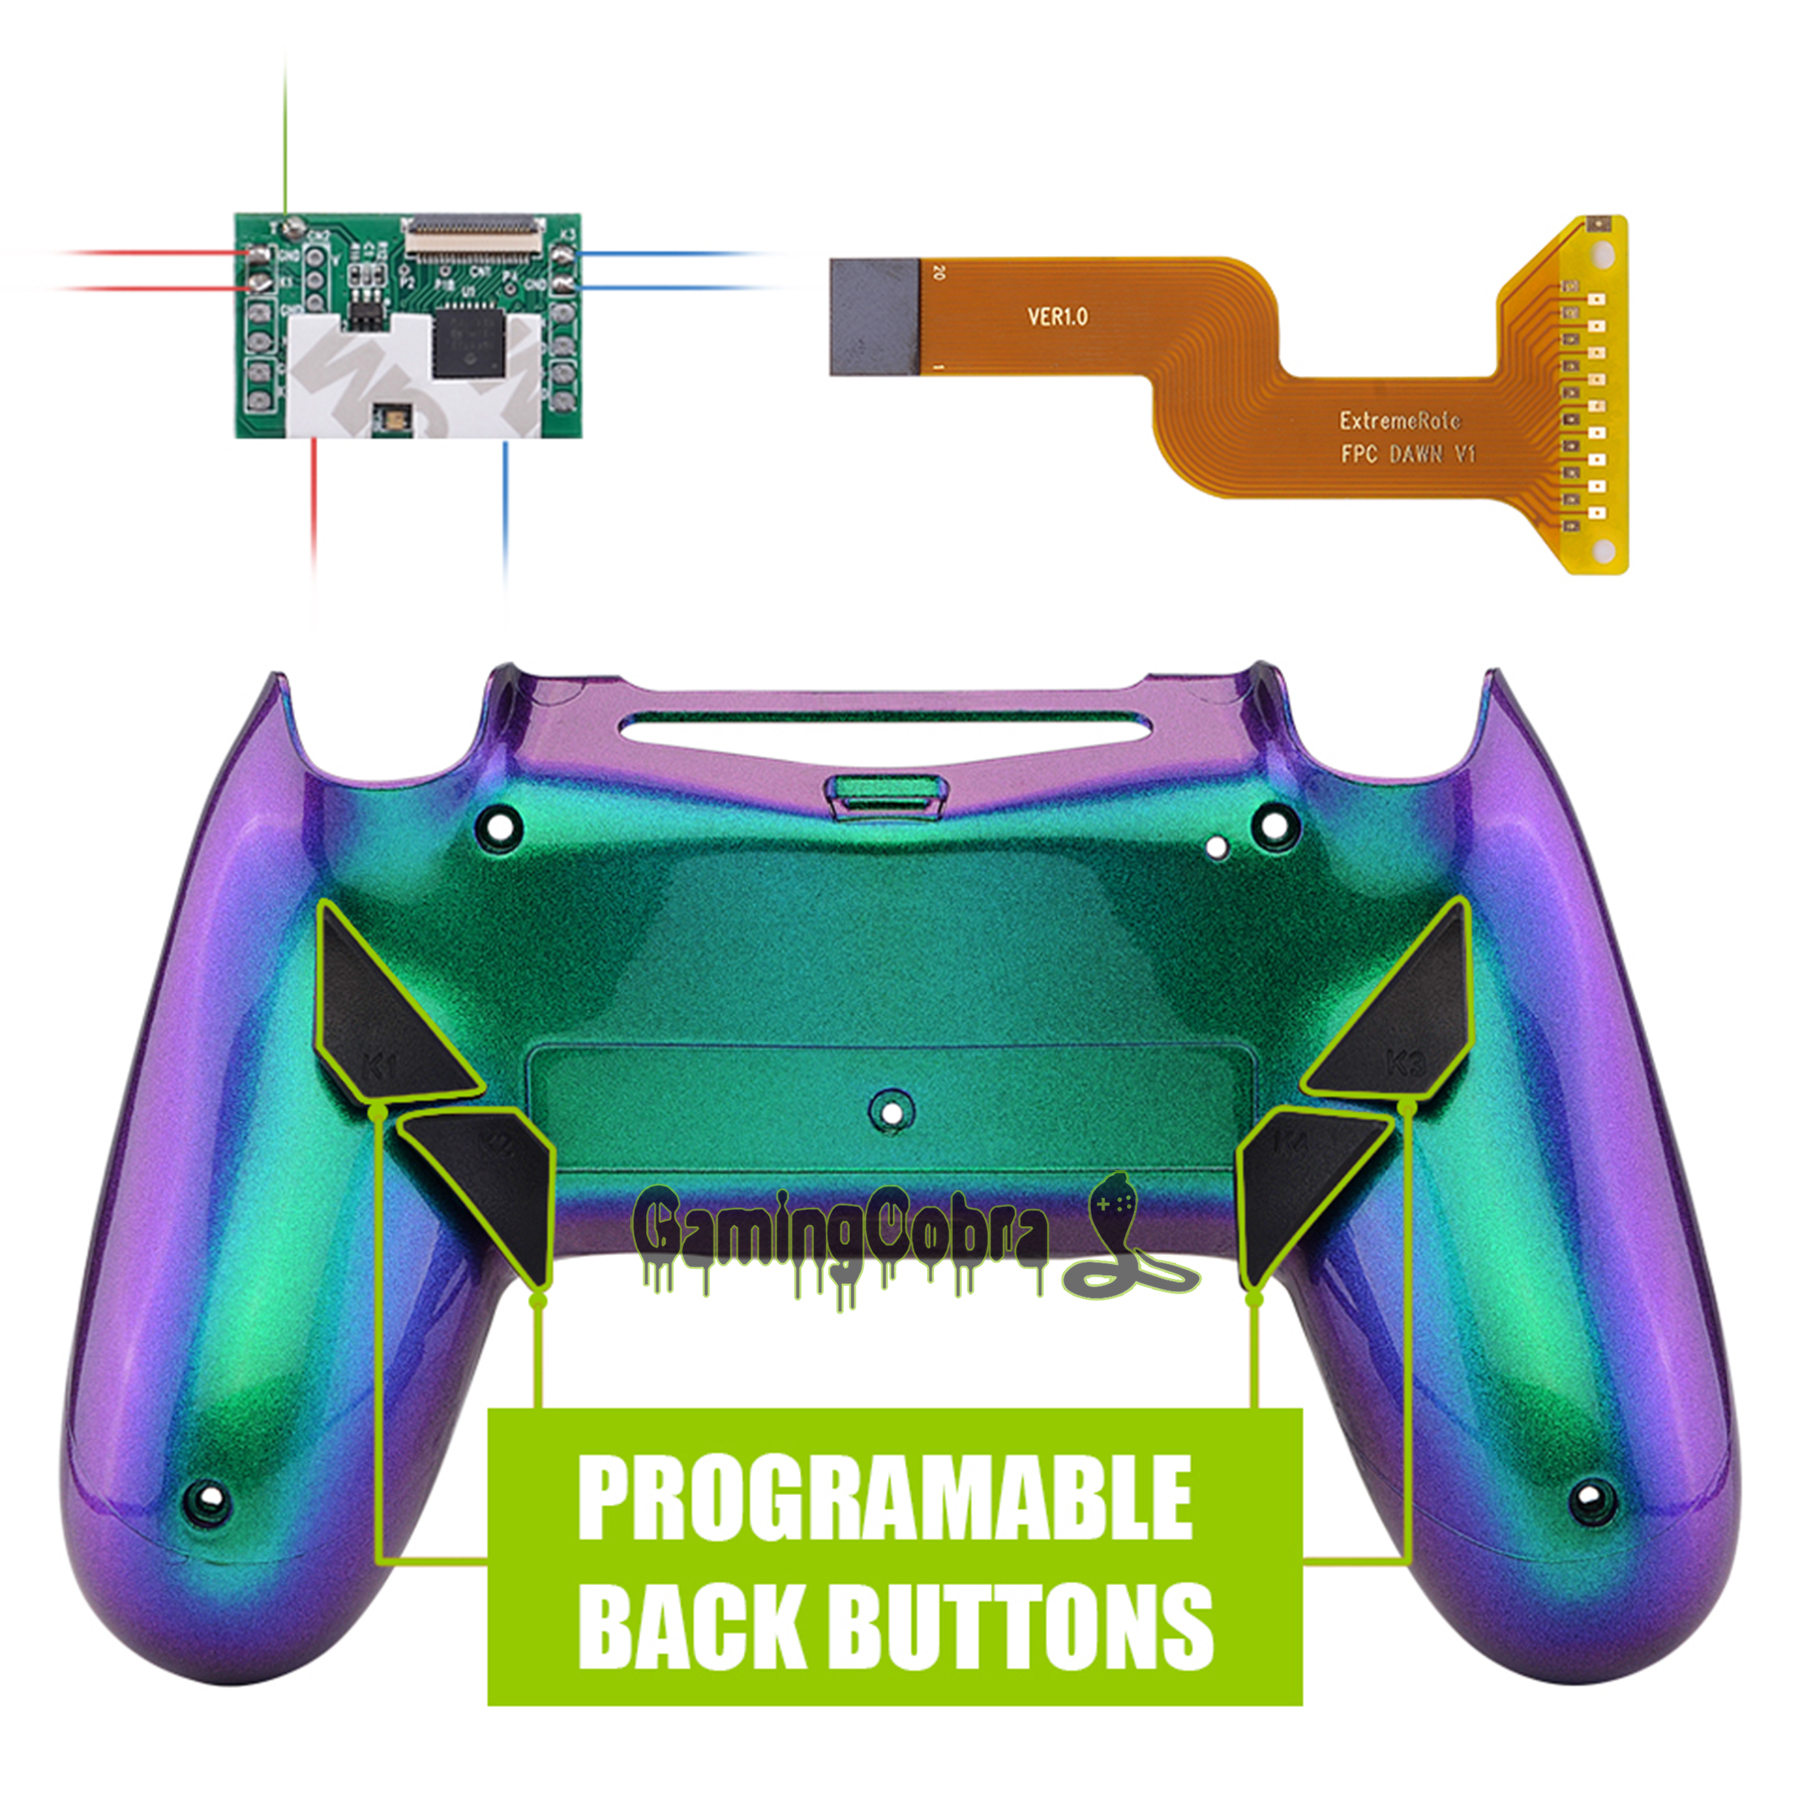 Chameleon Green Purple Dawn Programable Remap Kit For PS4 Slim Pro Controller JDM 040/050/055 W/ Back Shell & 4 Back Buttons